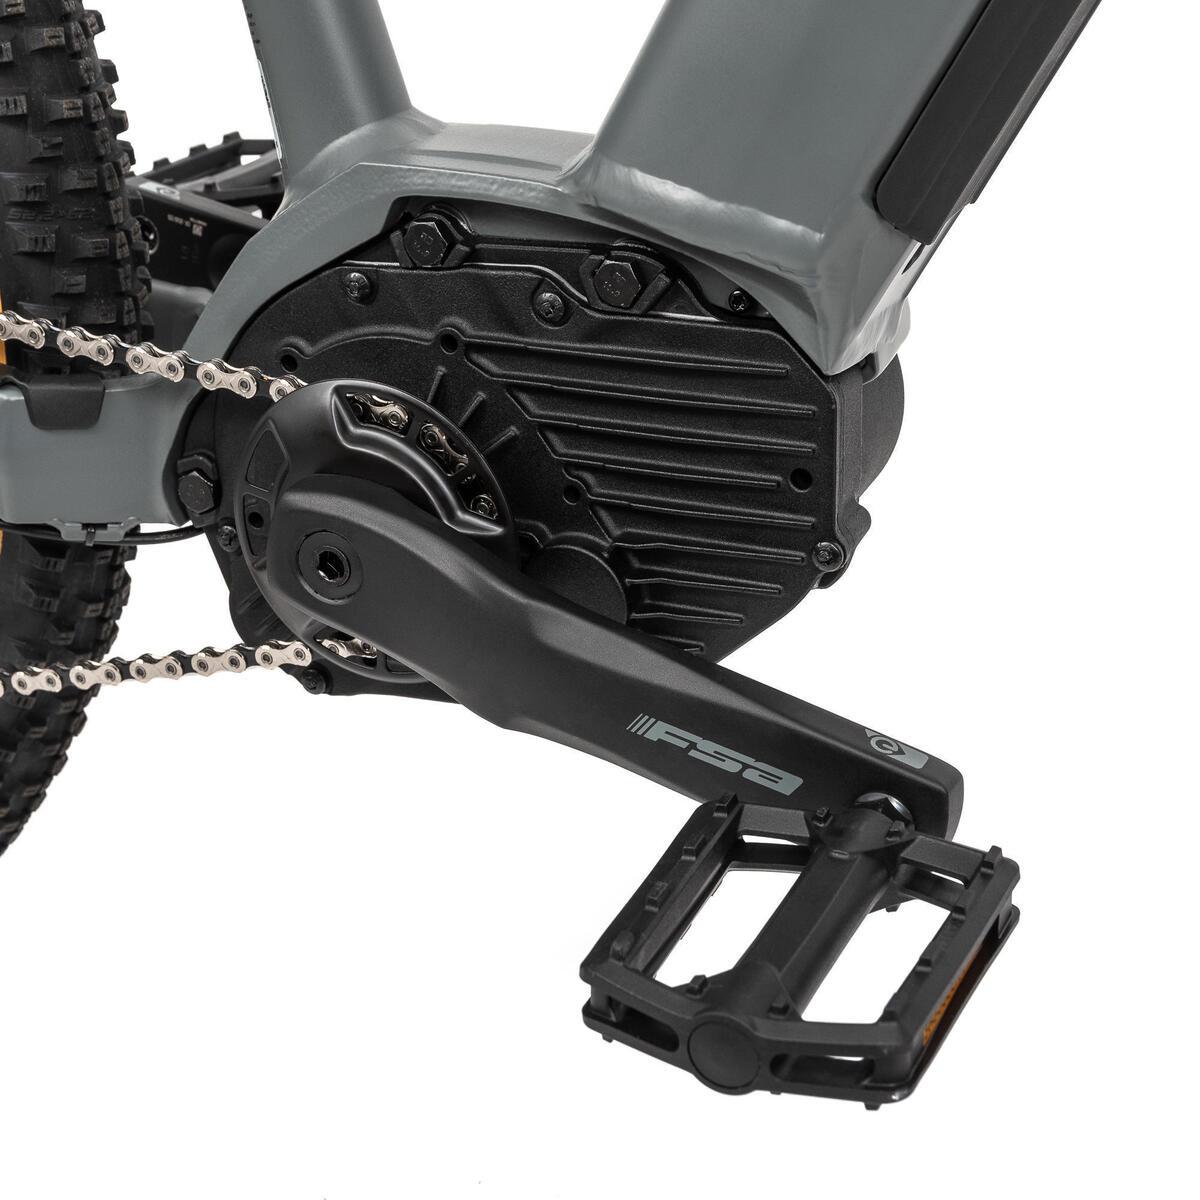 Bild 4 von E-Mountainbike 29 Zoll RR 900 Performance CX 500 Wh